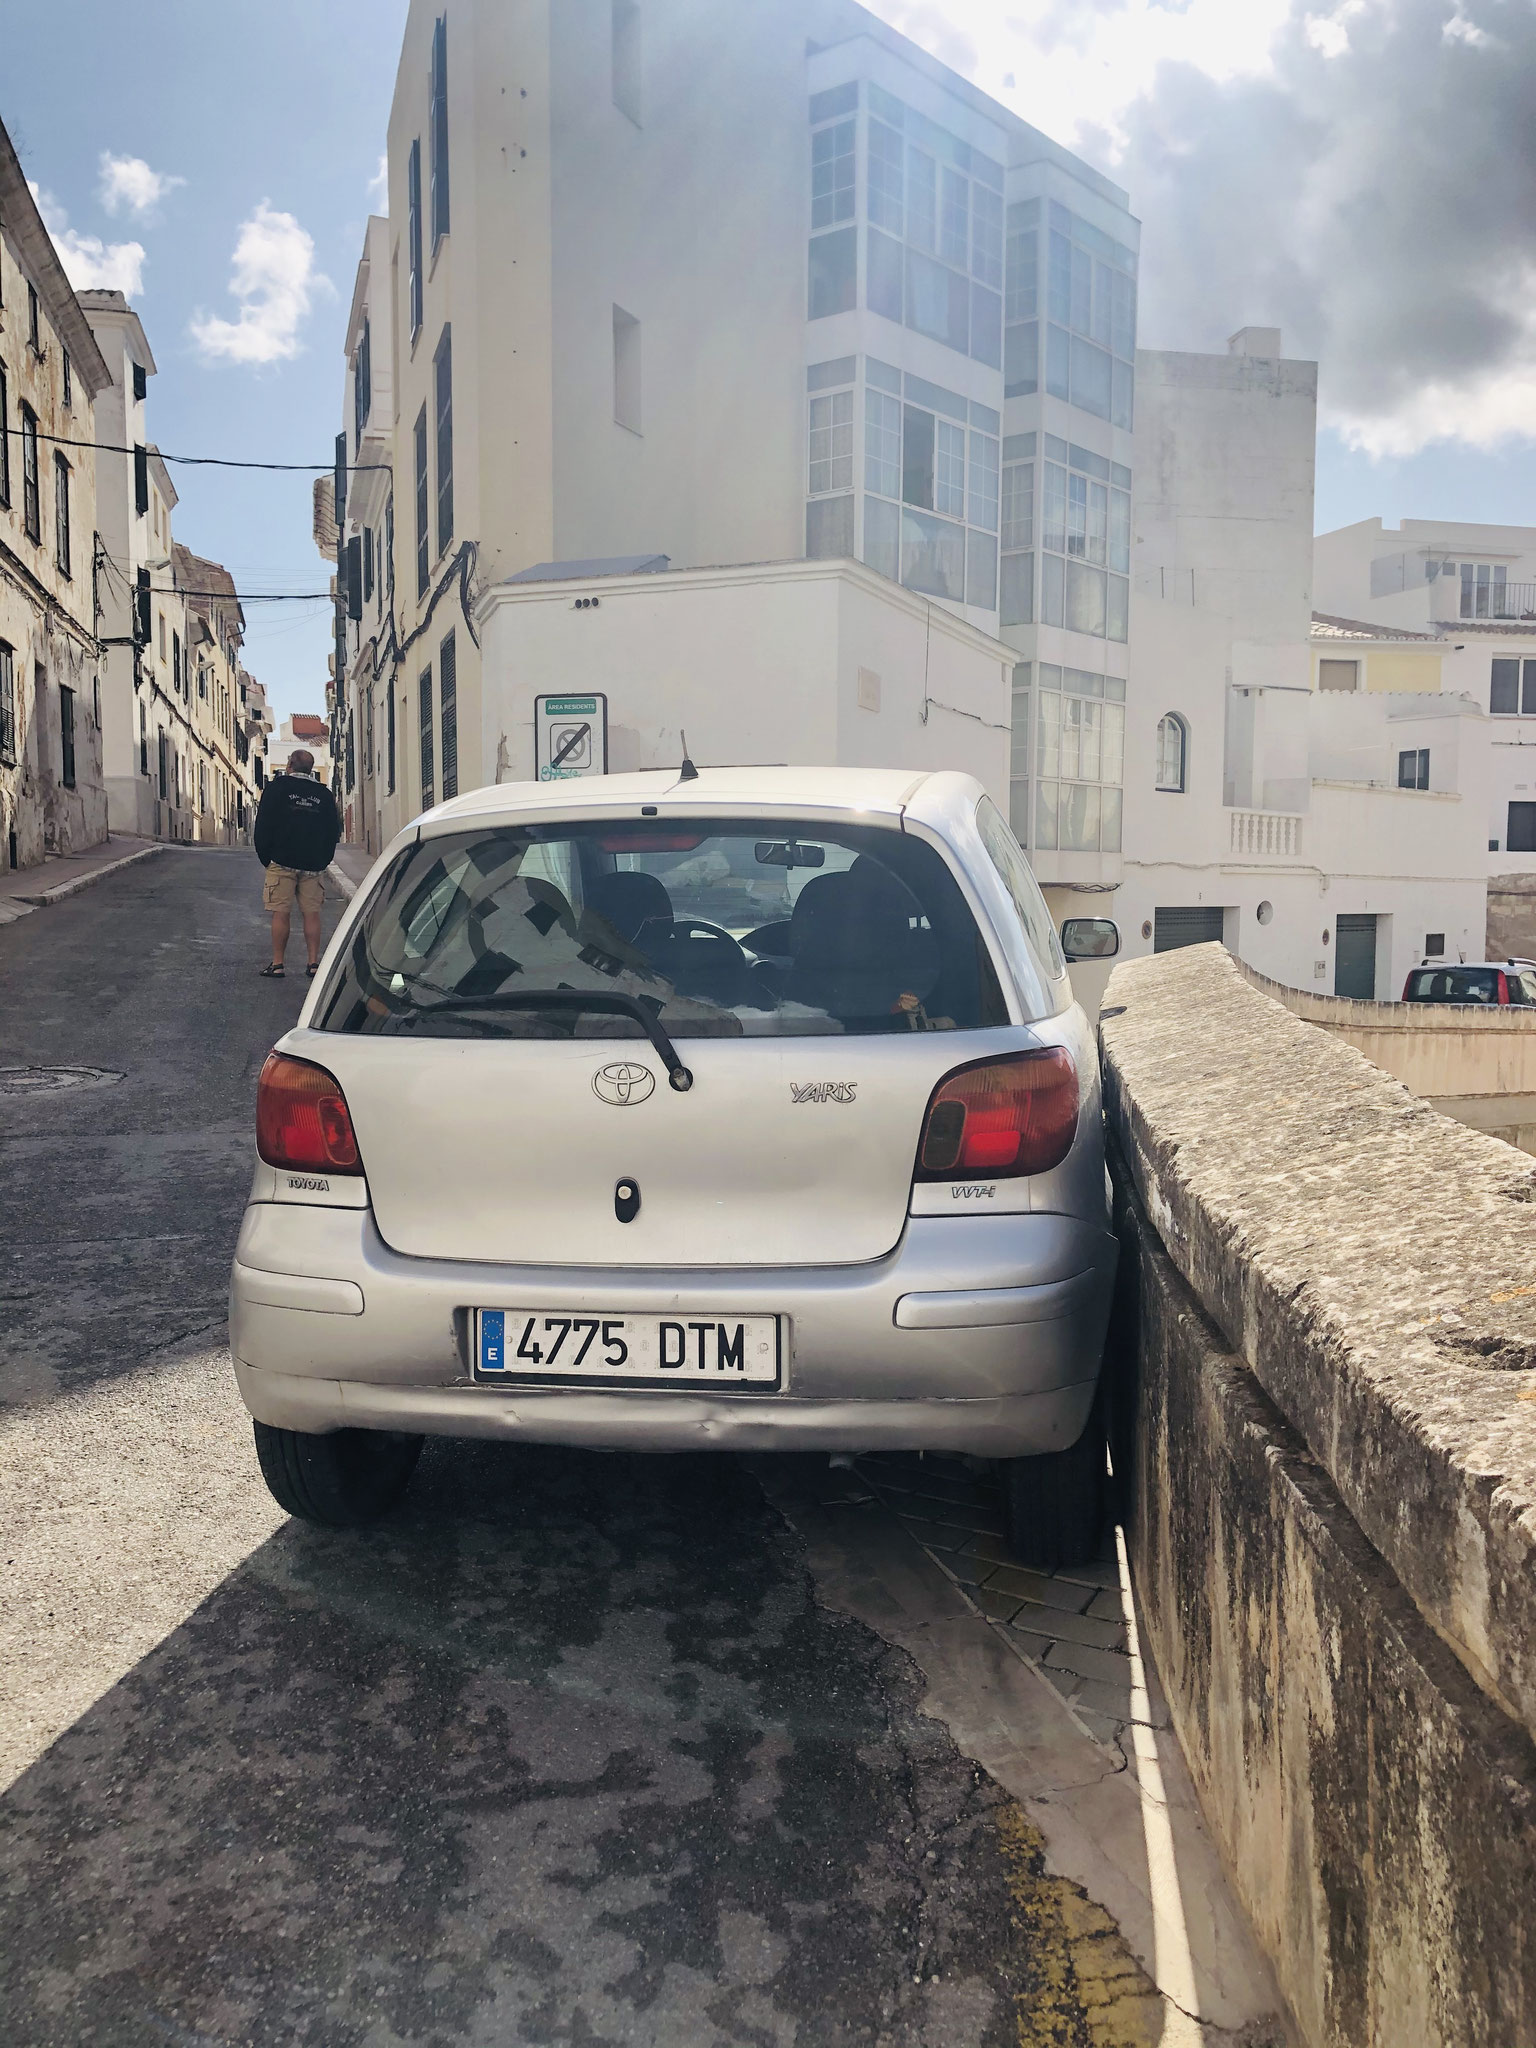 Gut geparkt...